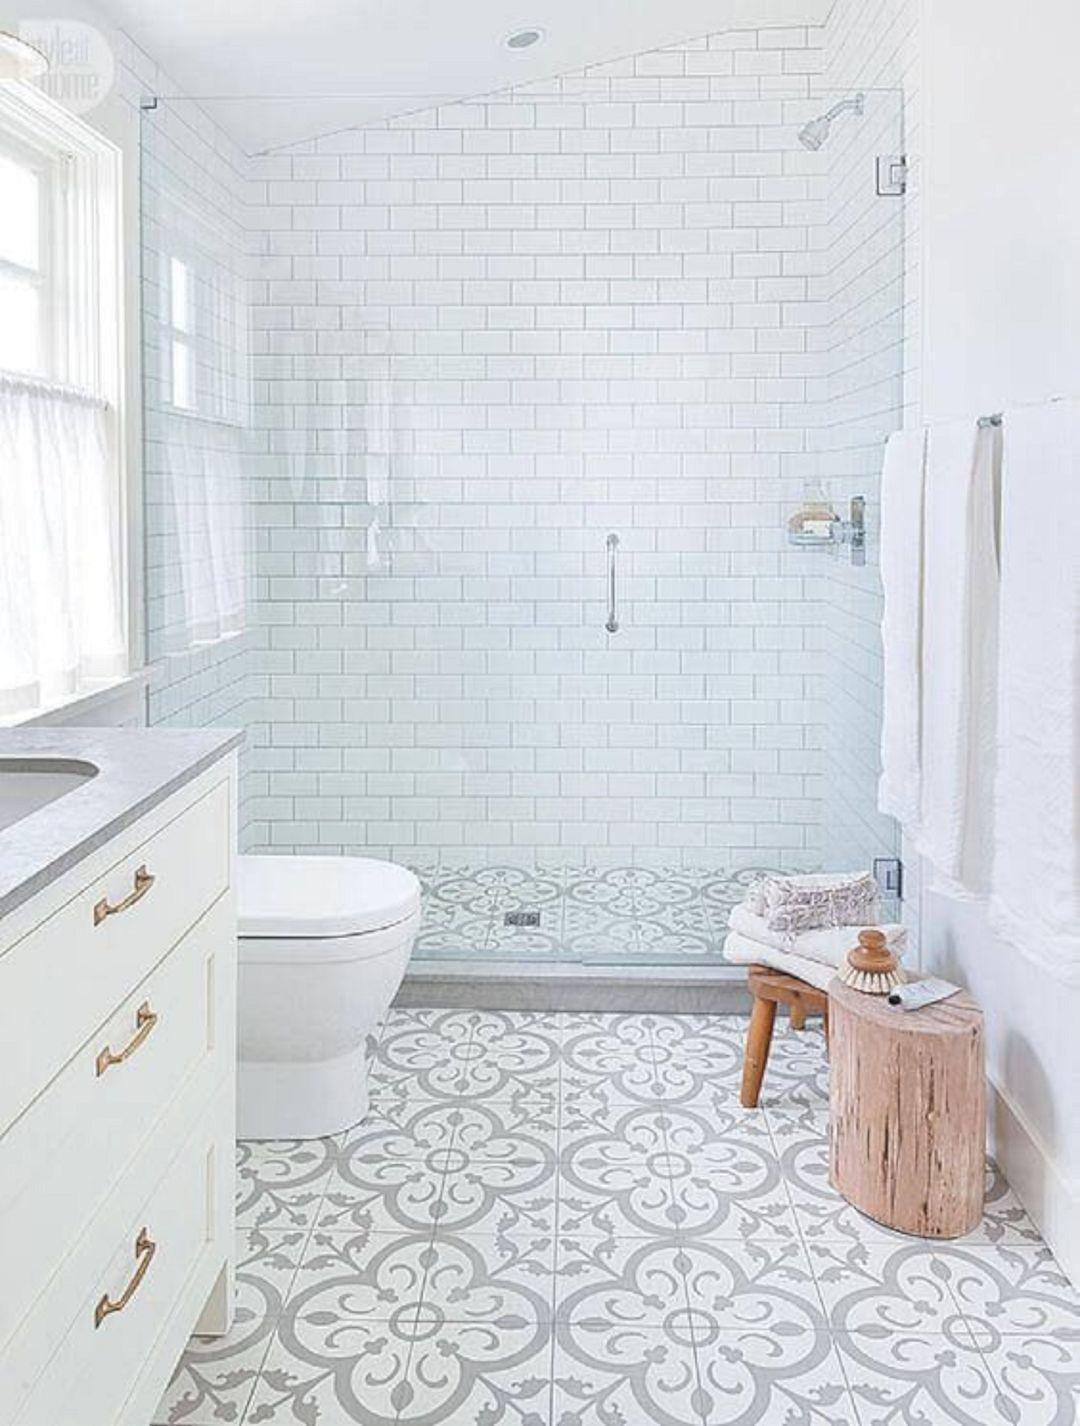 16 Small Bathroom Renovation Ideas | Pinterest | Small bathroom ...